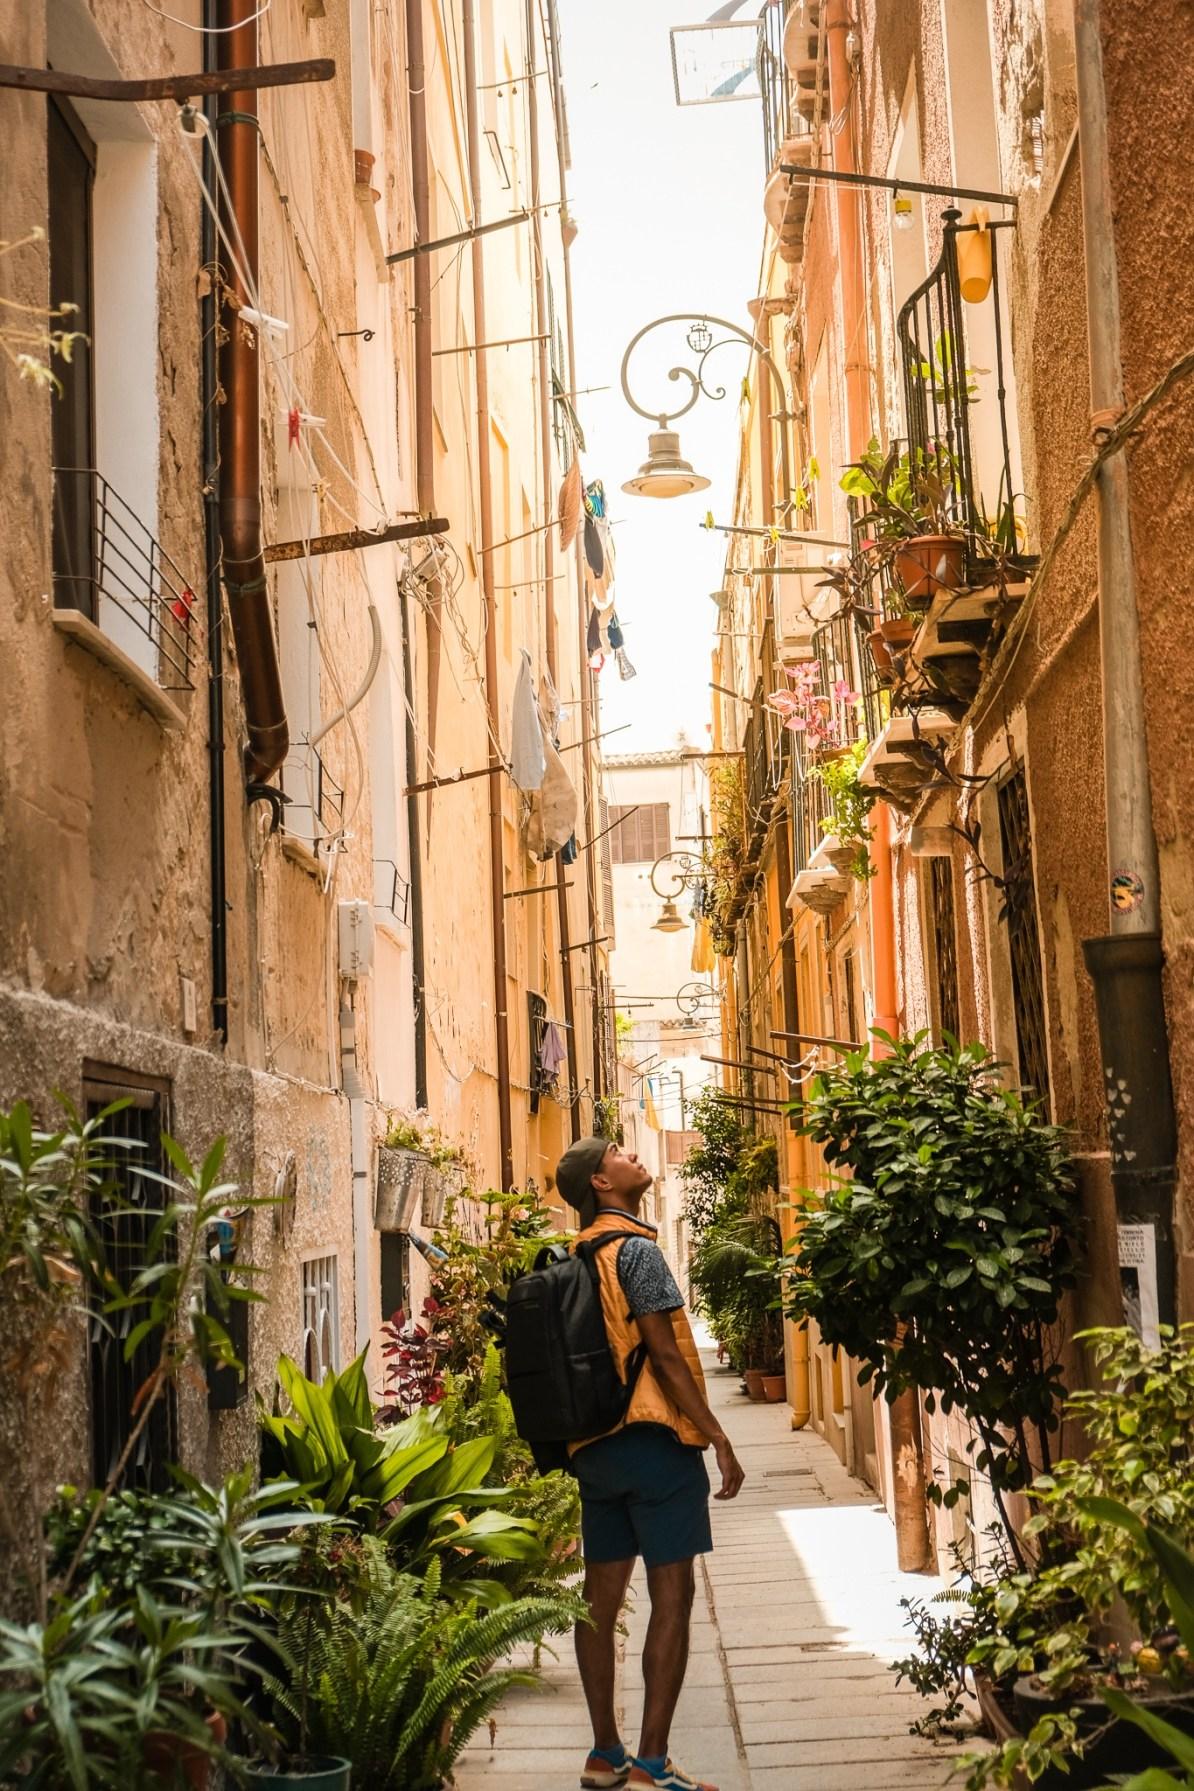 La quartier historique de la Cagliari en Sardaigne